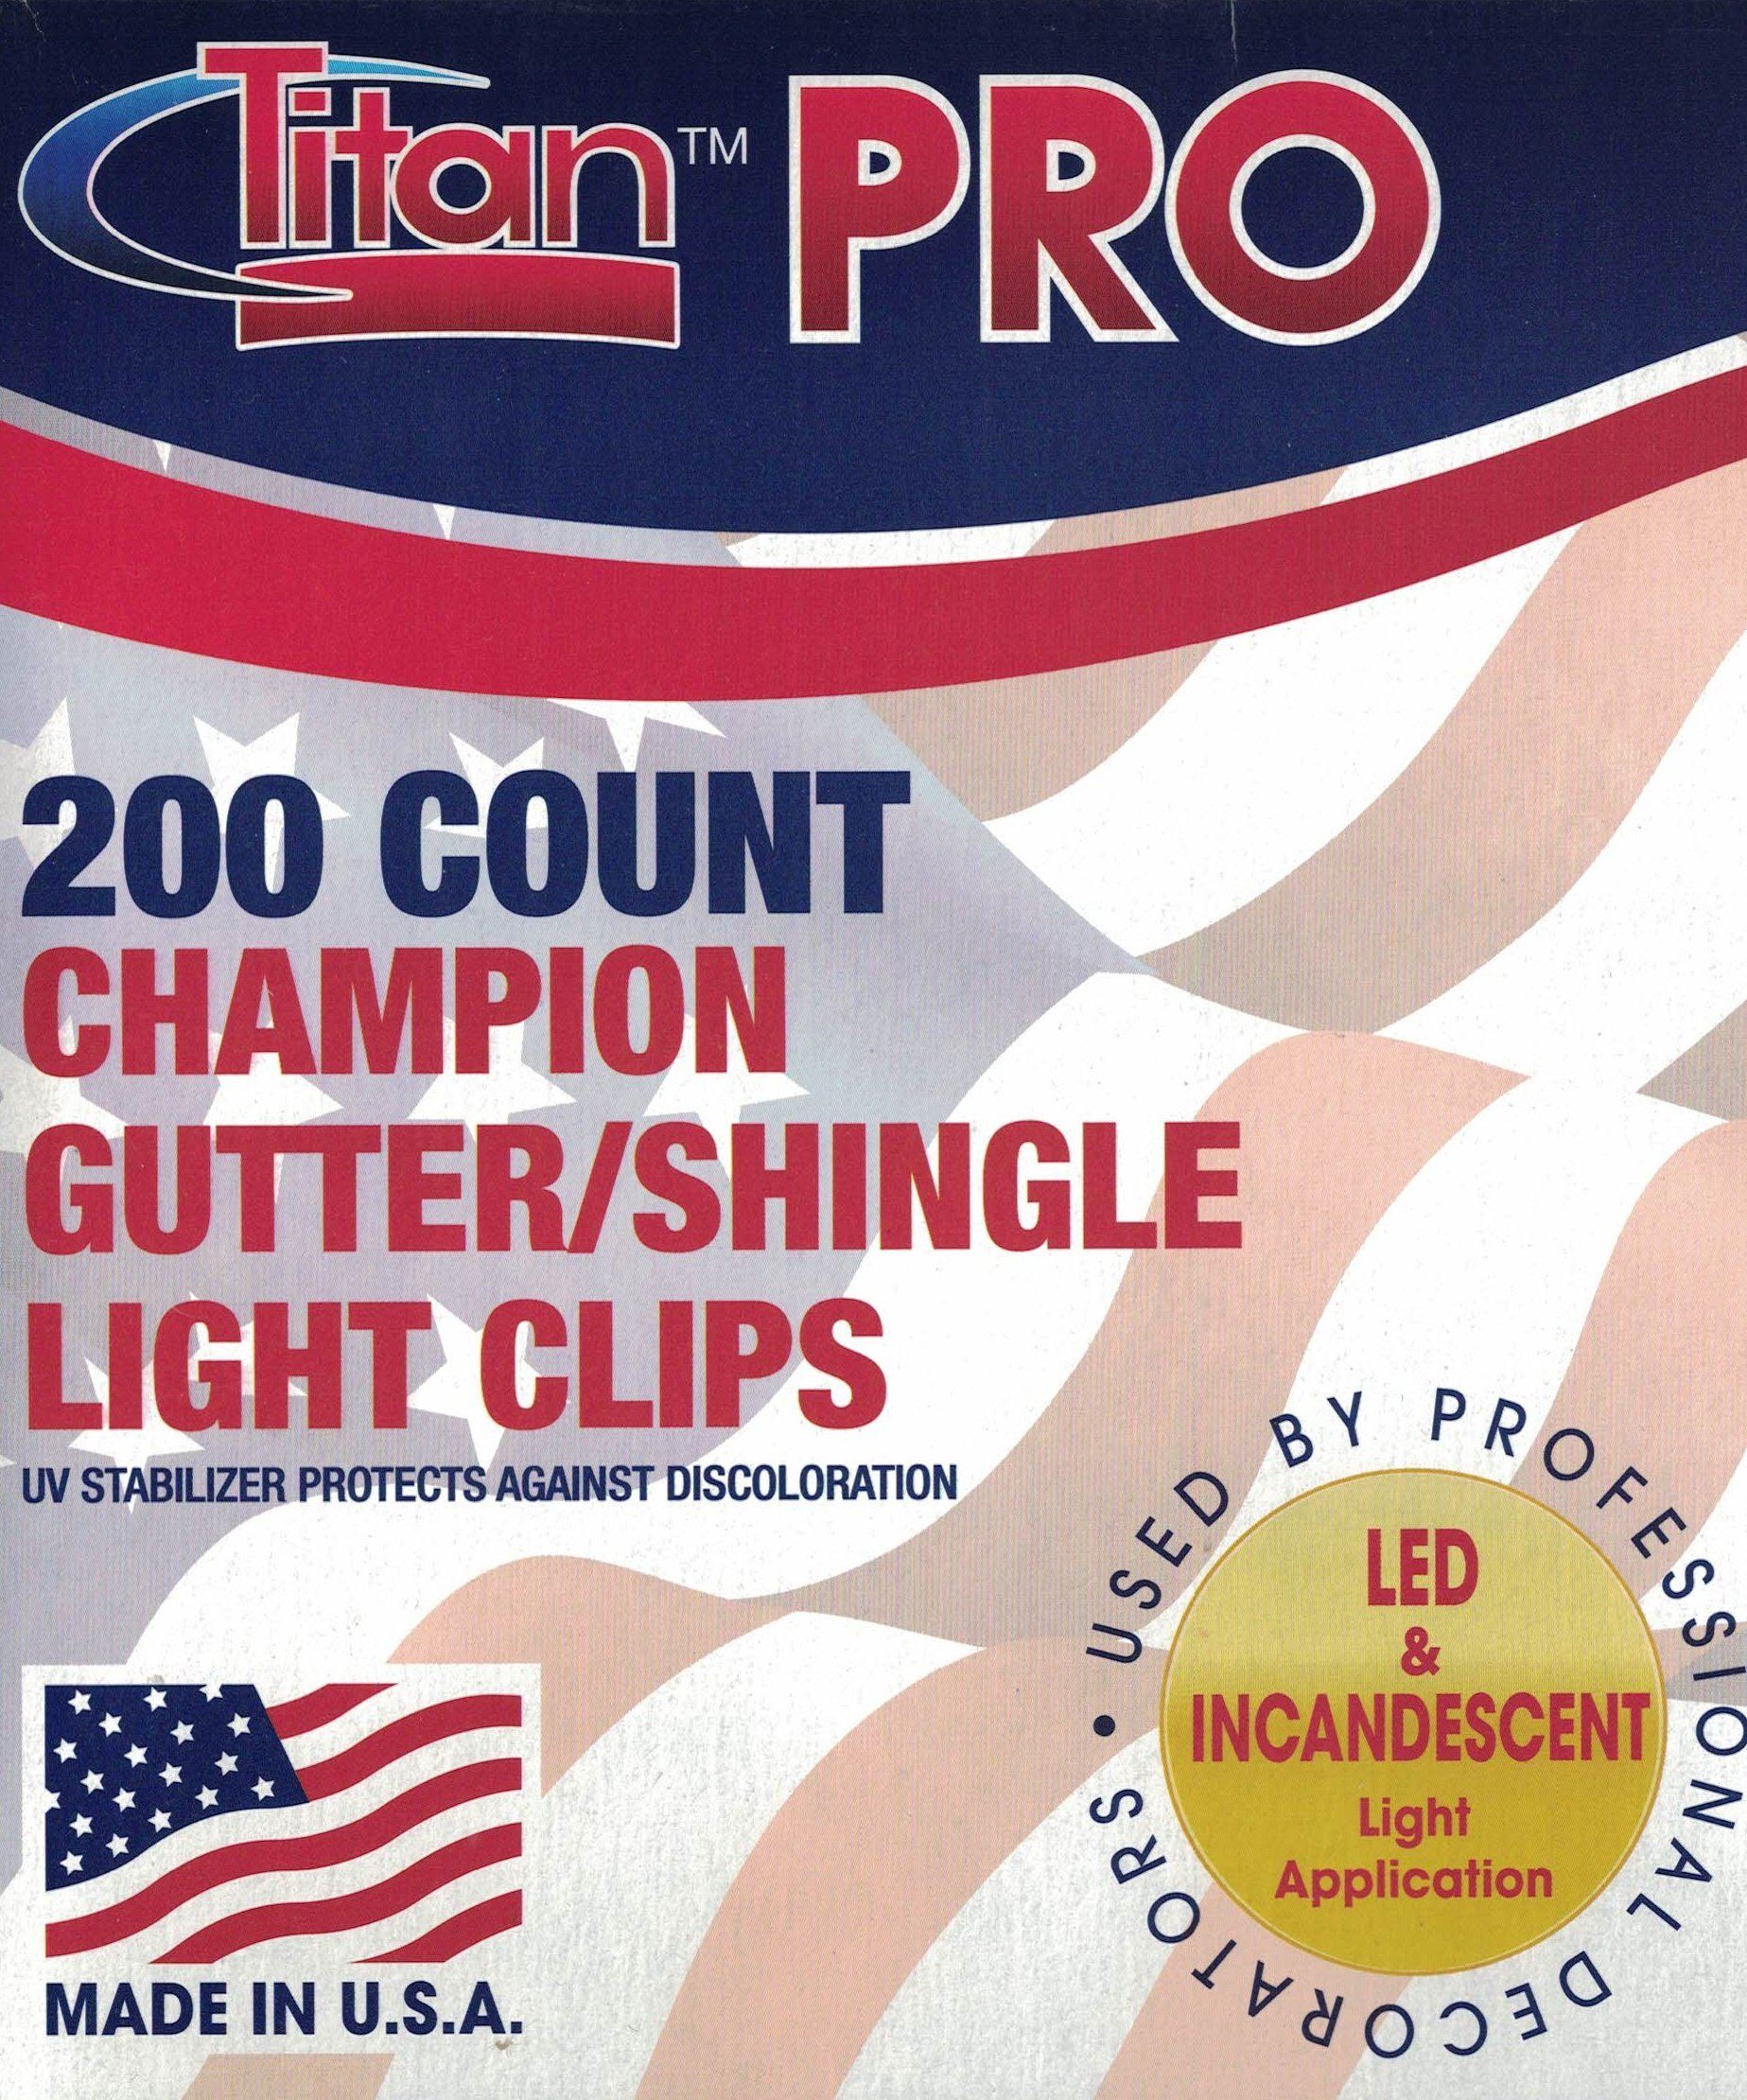 200 Count Champion Gutter/Shingle Light Clips